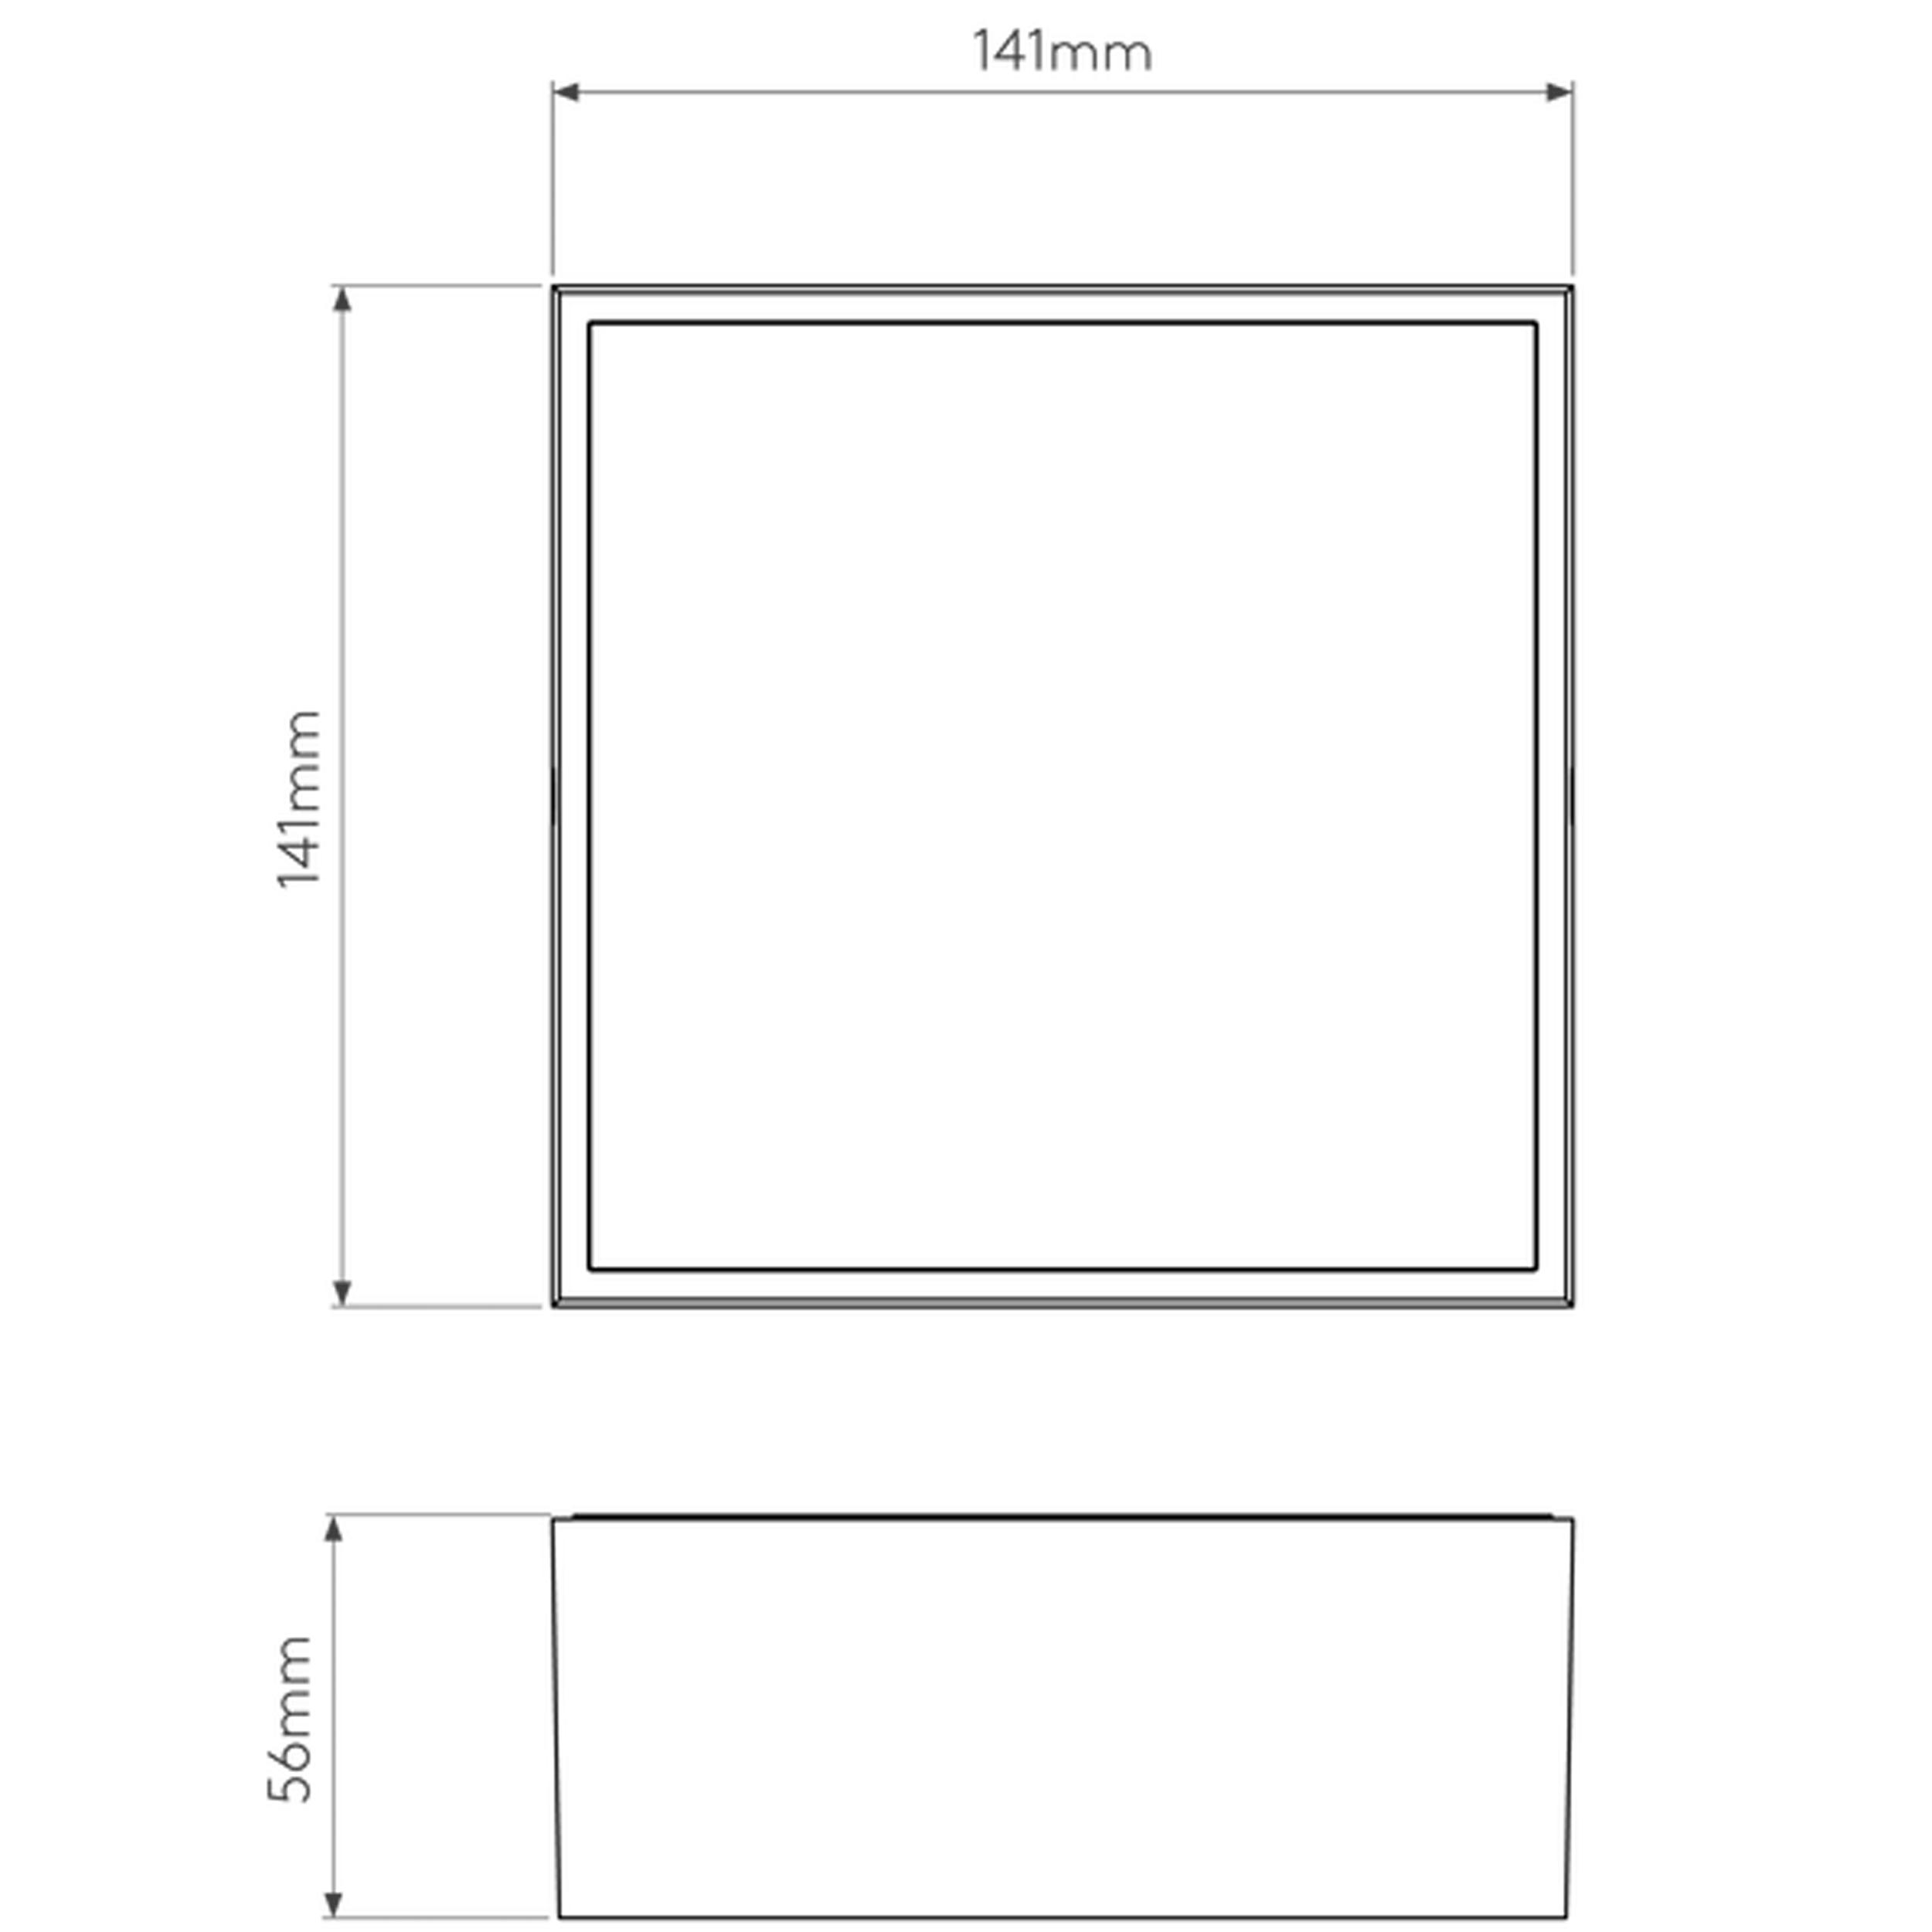 Astro Kea 140 Square Wall Light Line Drawing